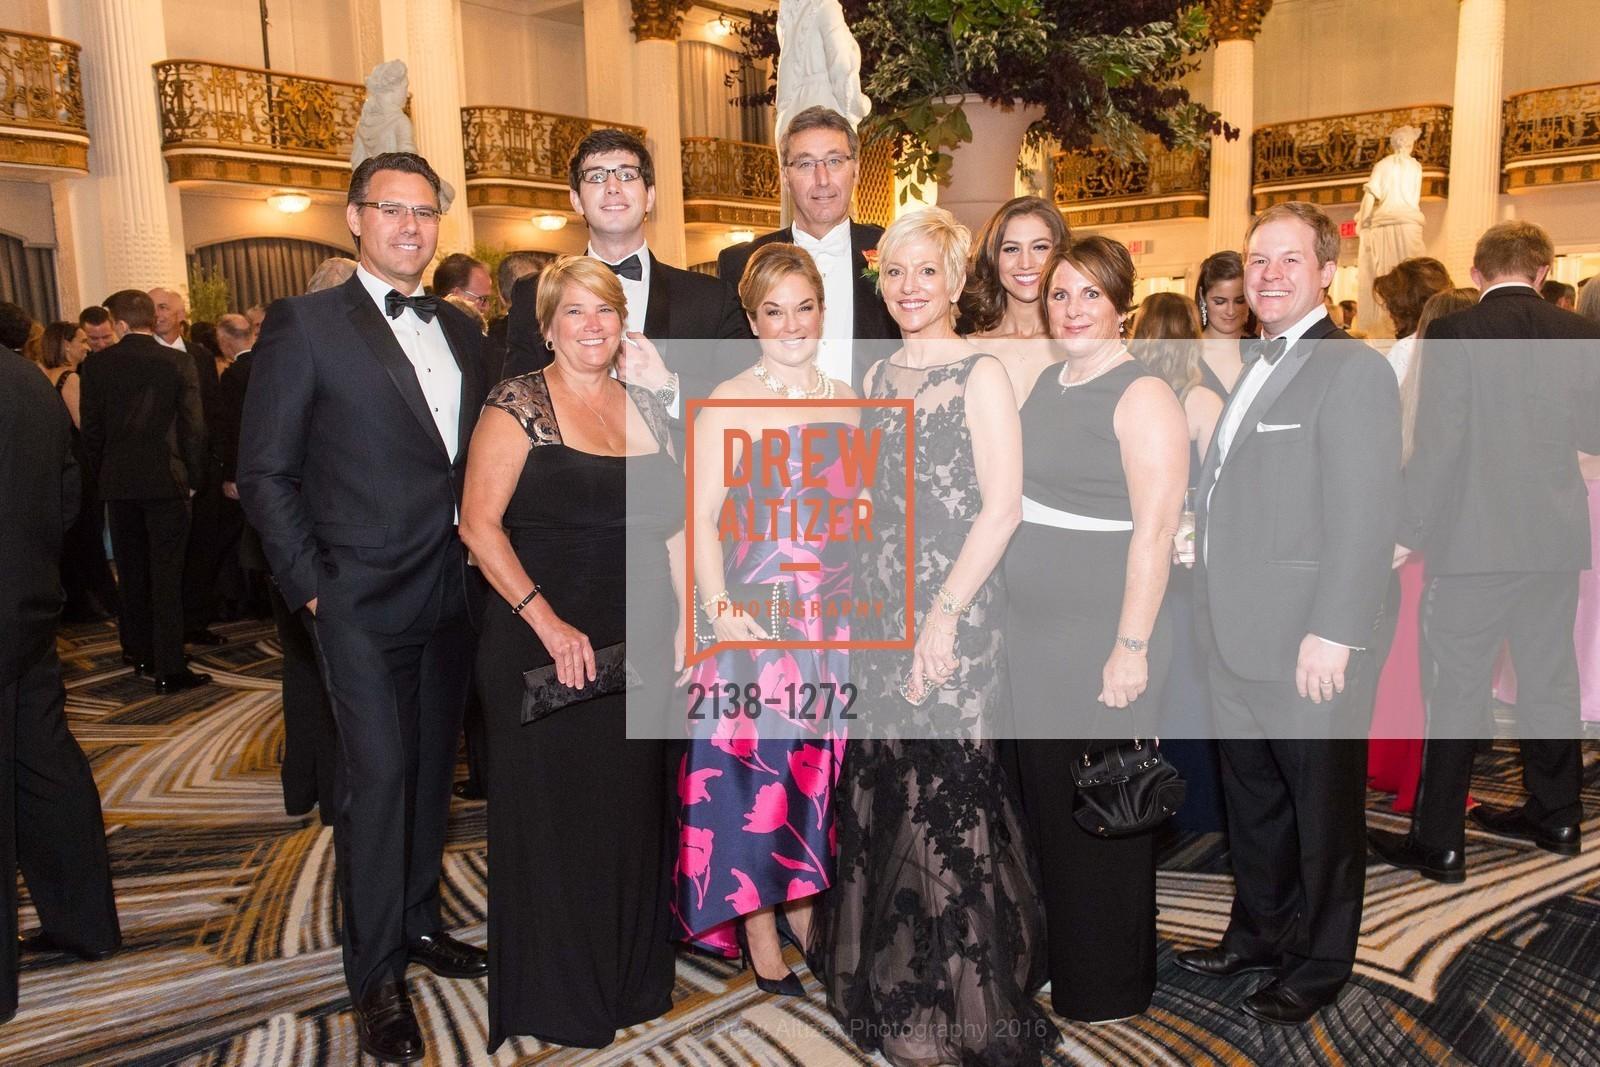 Ingrid Coolins, Anna Dierkhising, John Sylvia, Shawn Sylvia, Mary Kay Stockwell, Kate Sylvia Root, Jay Root, Photo #2138-1272